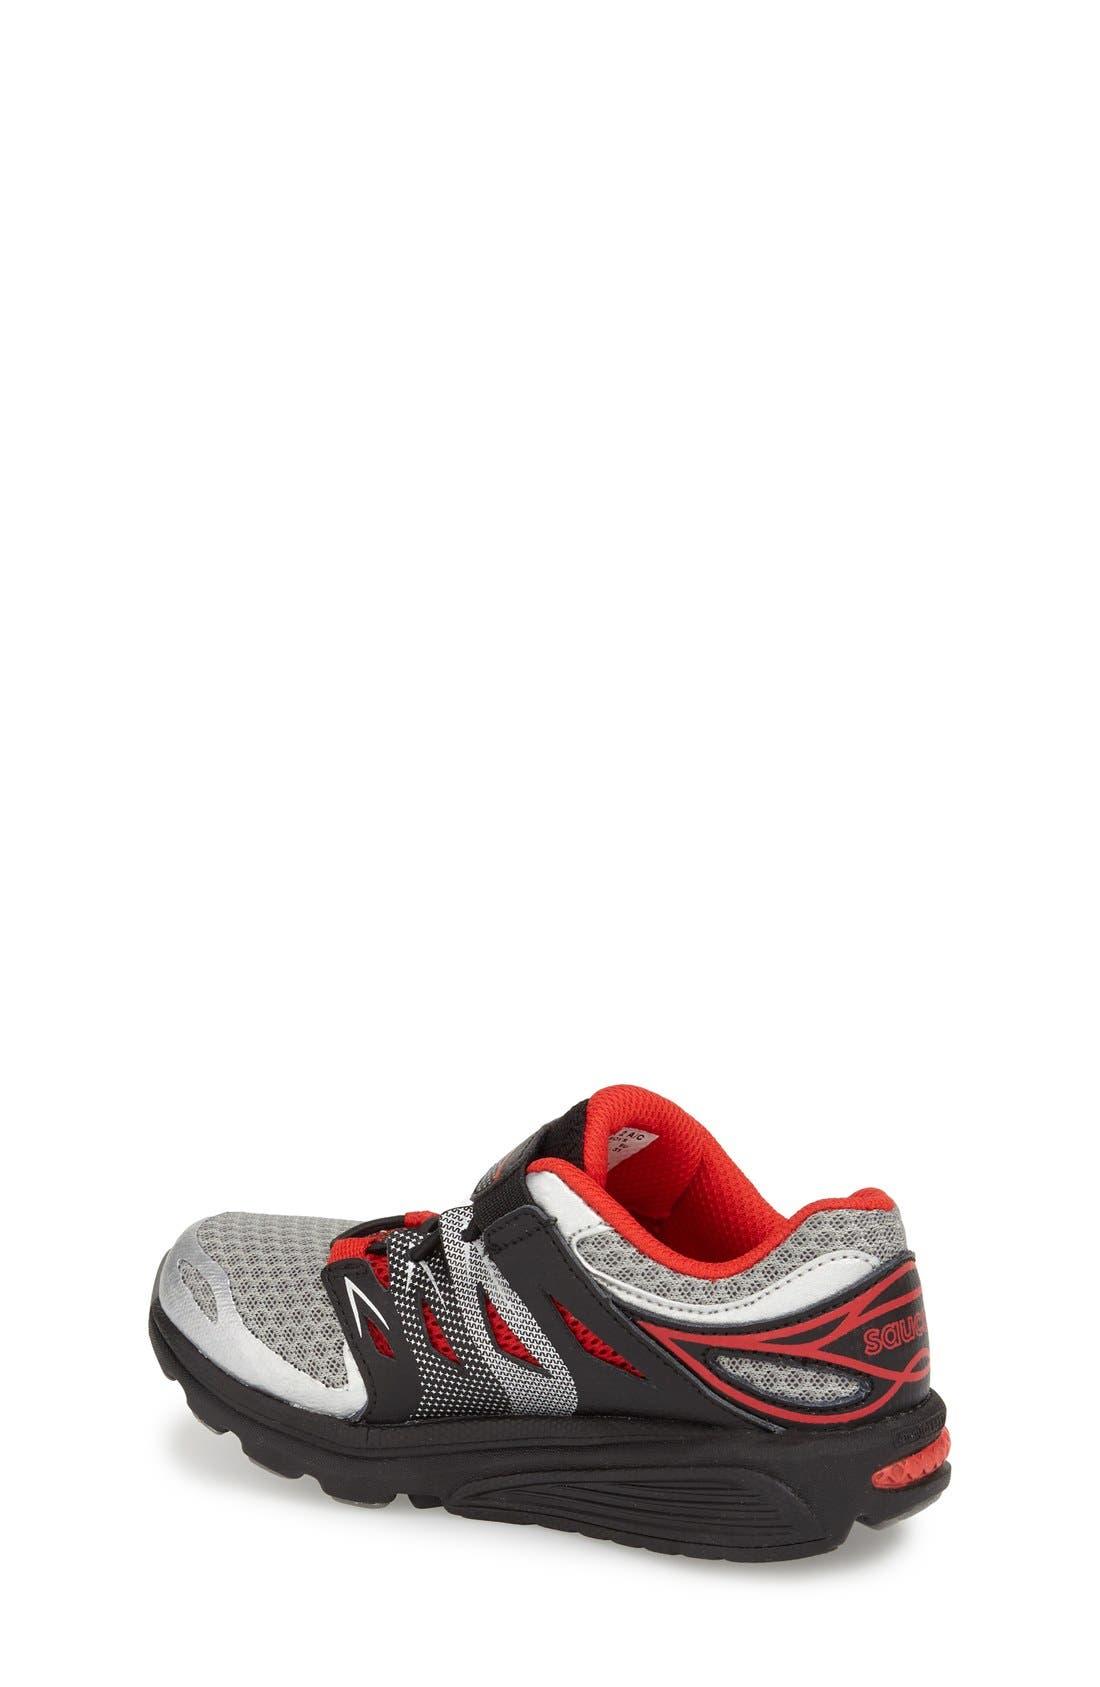 'Zealot 2 AC' Running Shoe,                             Alternate thumbnail 2, color,                             020